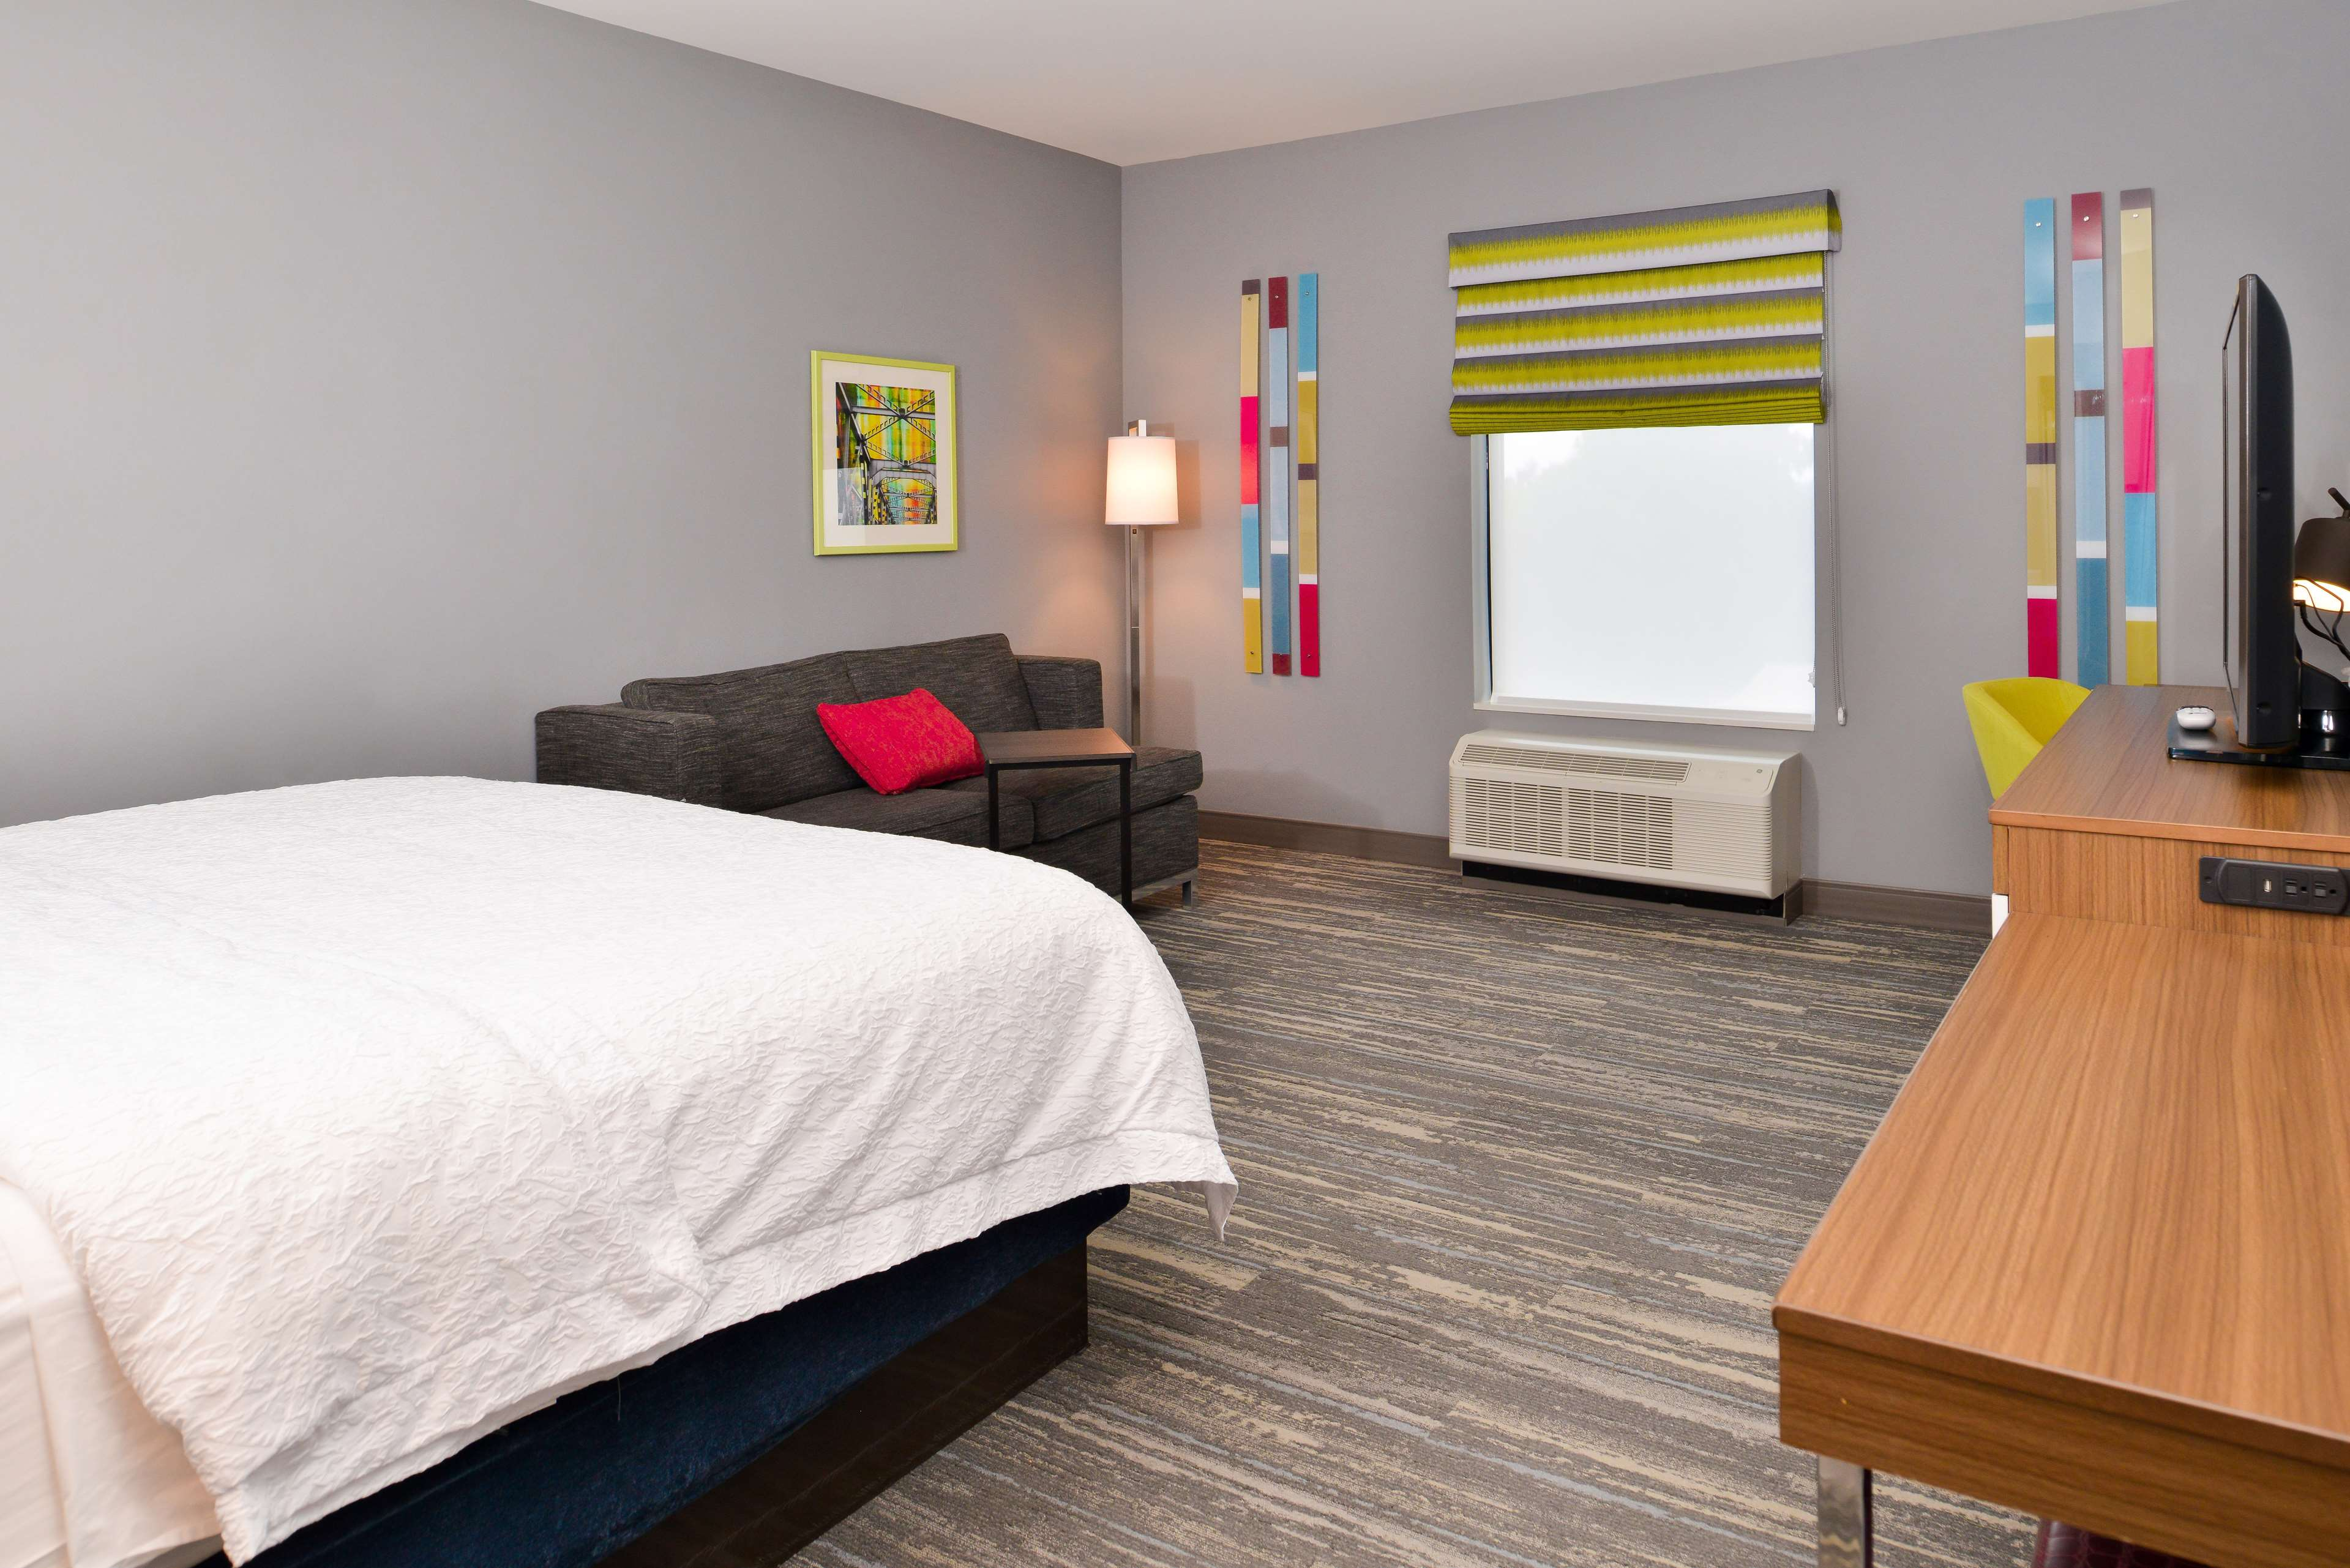 Hampton Inn & Suites St. Paul Oakdale/Woodbury image 14